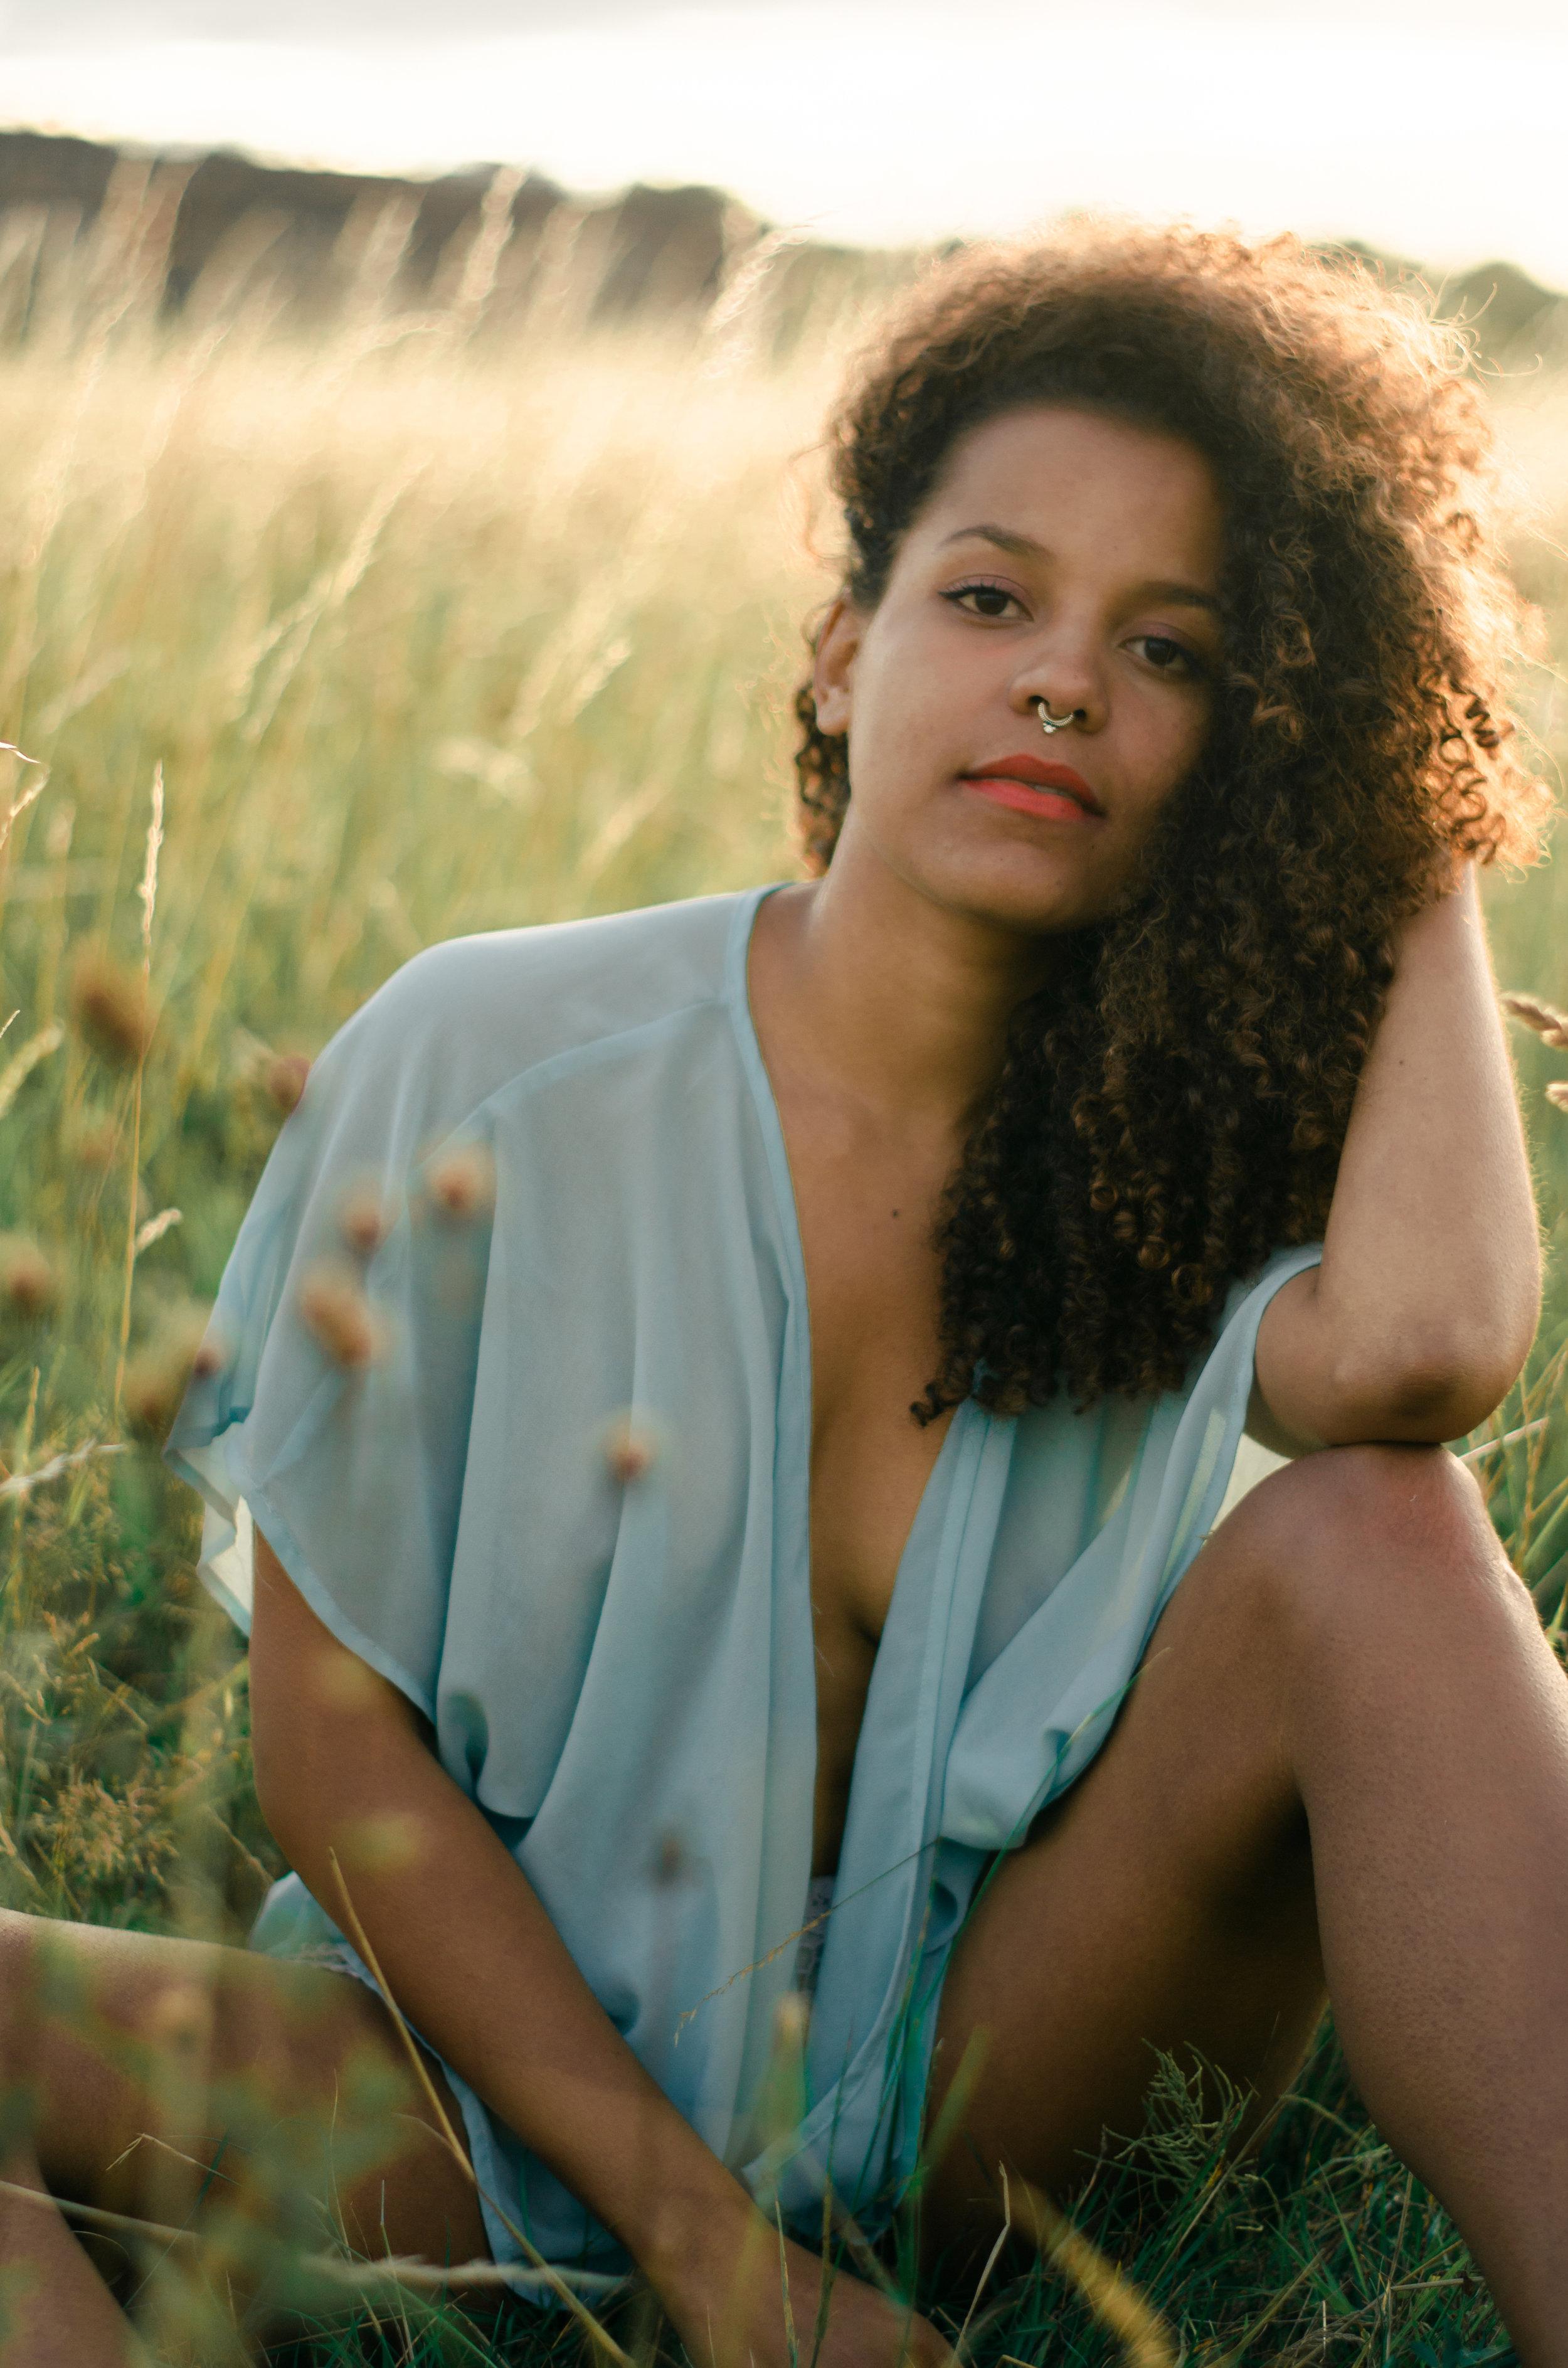 Inka-Portrait-Session-Aiste-Saulyte-Photography-17-07-30-364.jpg